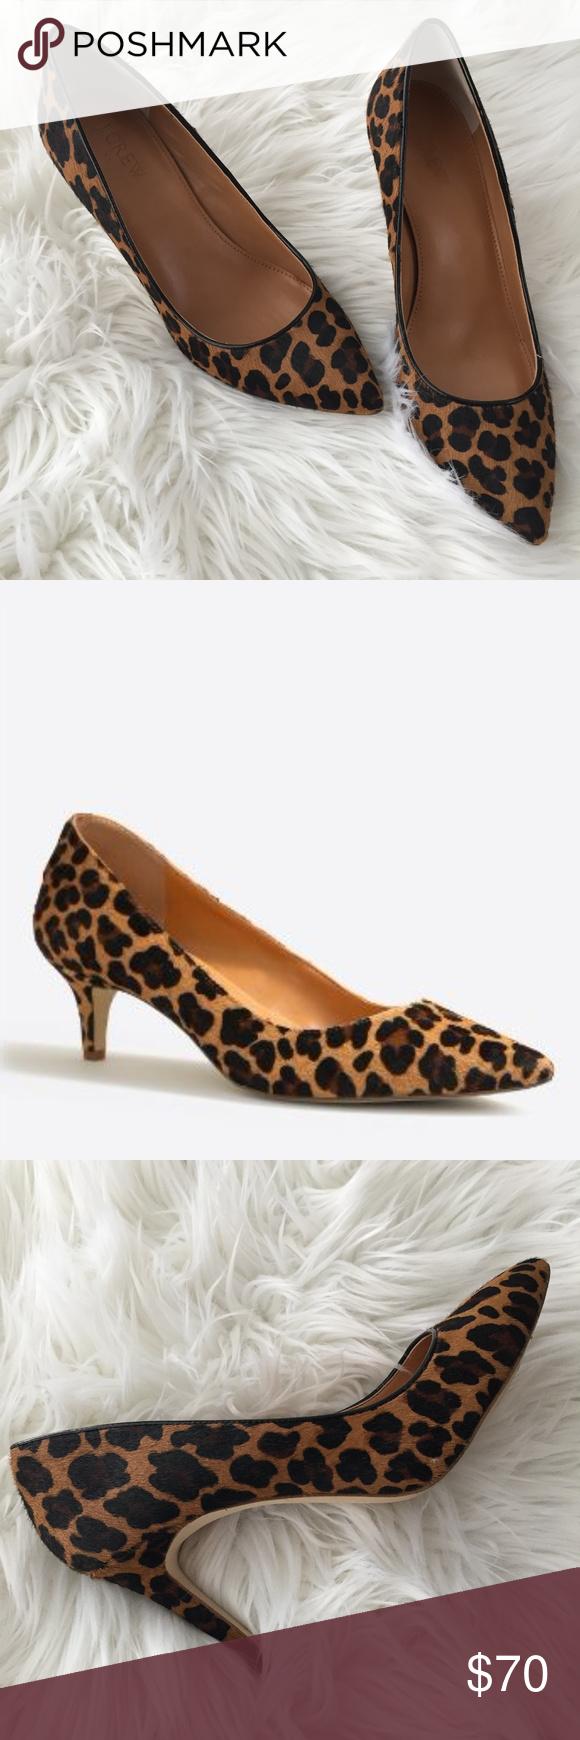 J Crew Esme Leopard Calf Hair Kitten Heels Kitten Heels Heels Calf Hair